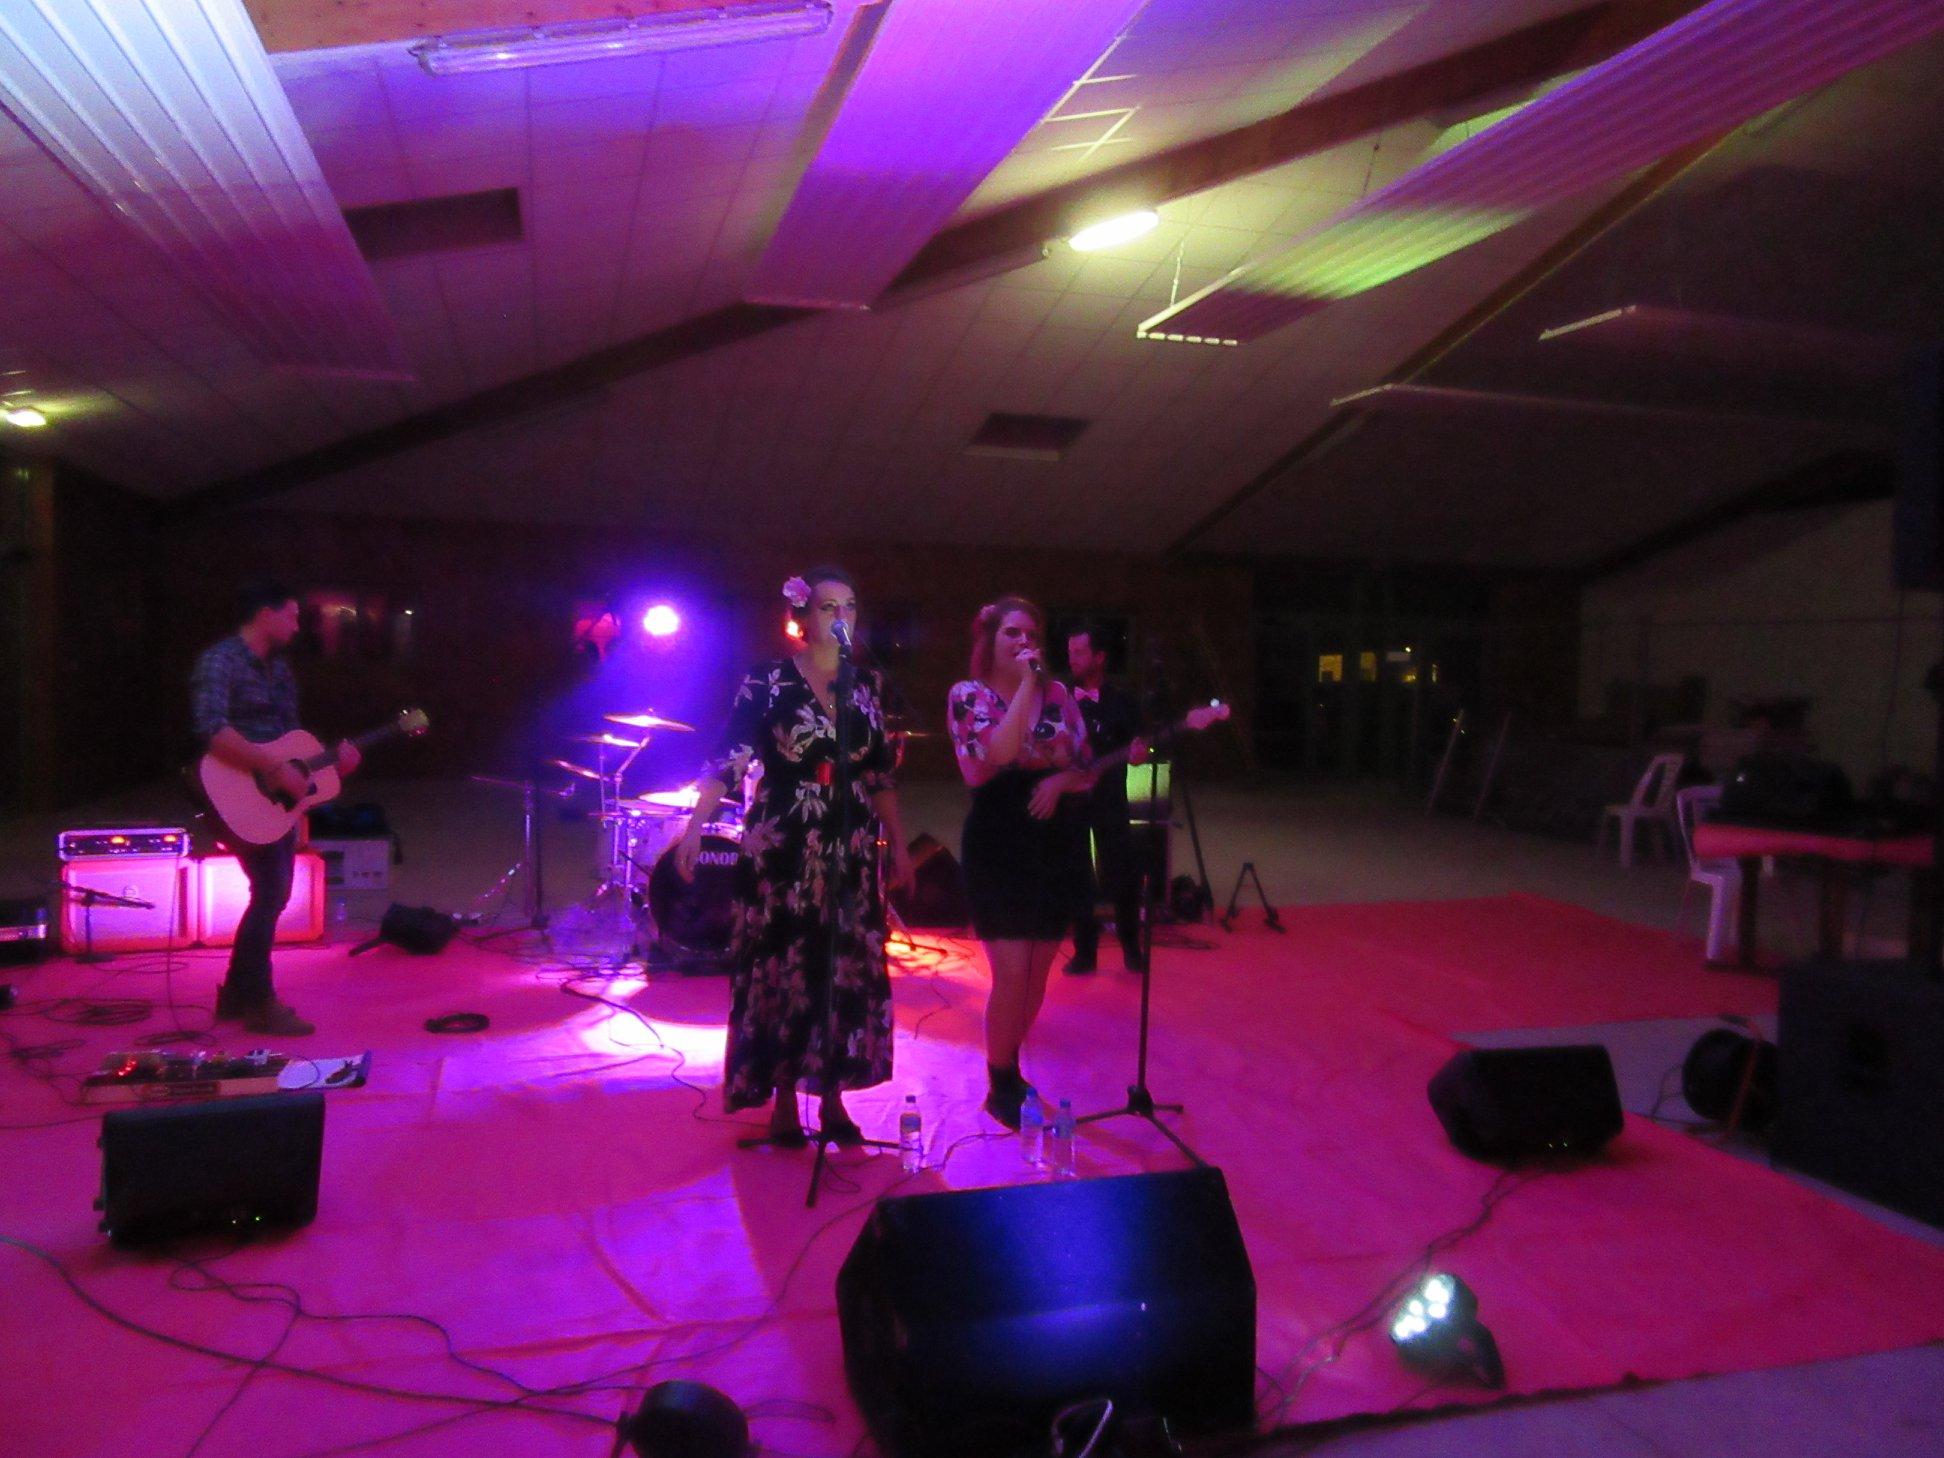 grande salle de restau - concert 4